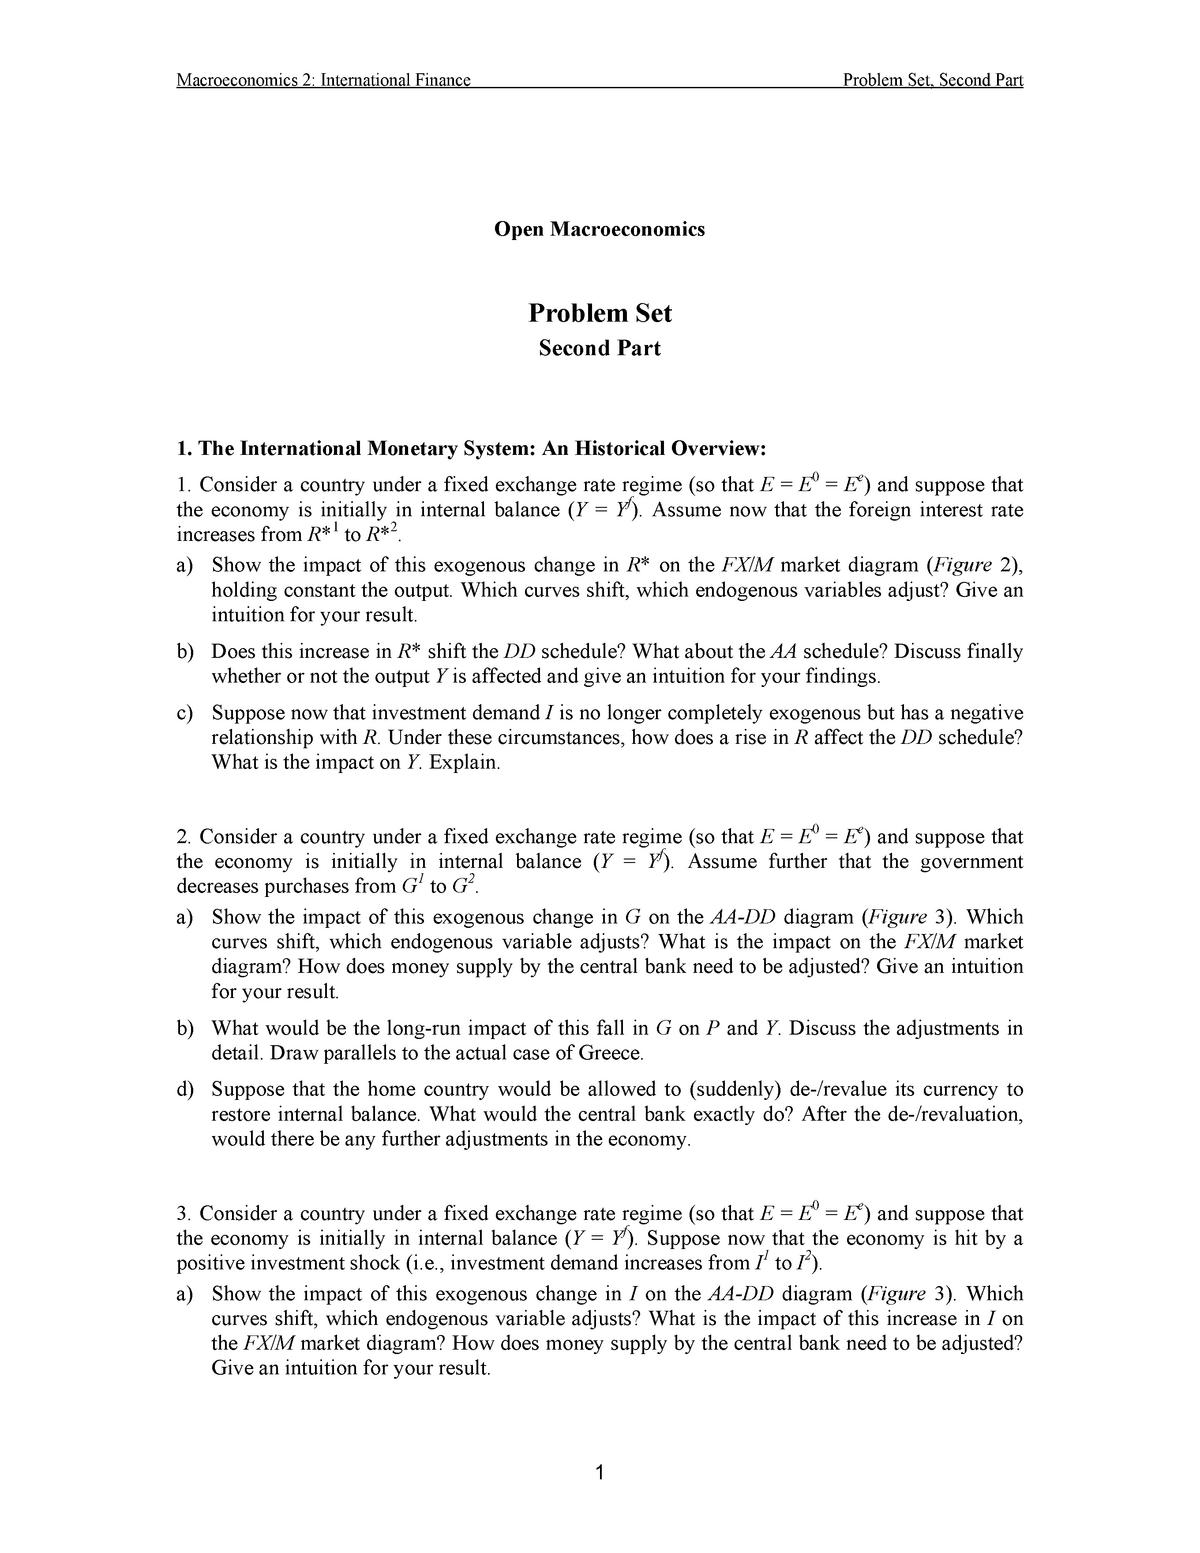 international finance notes for mcom